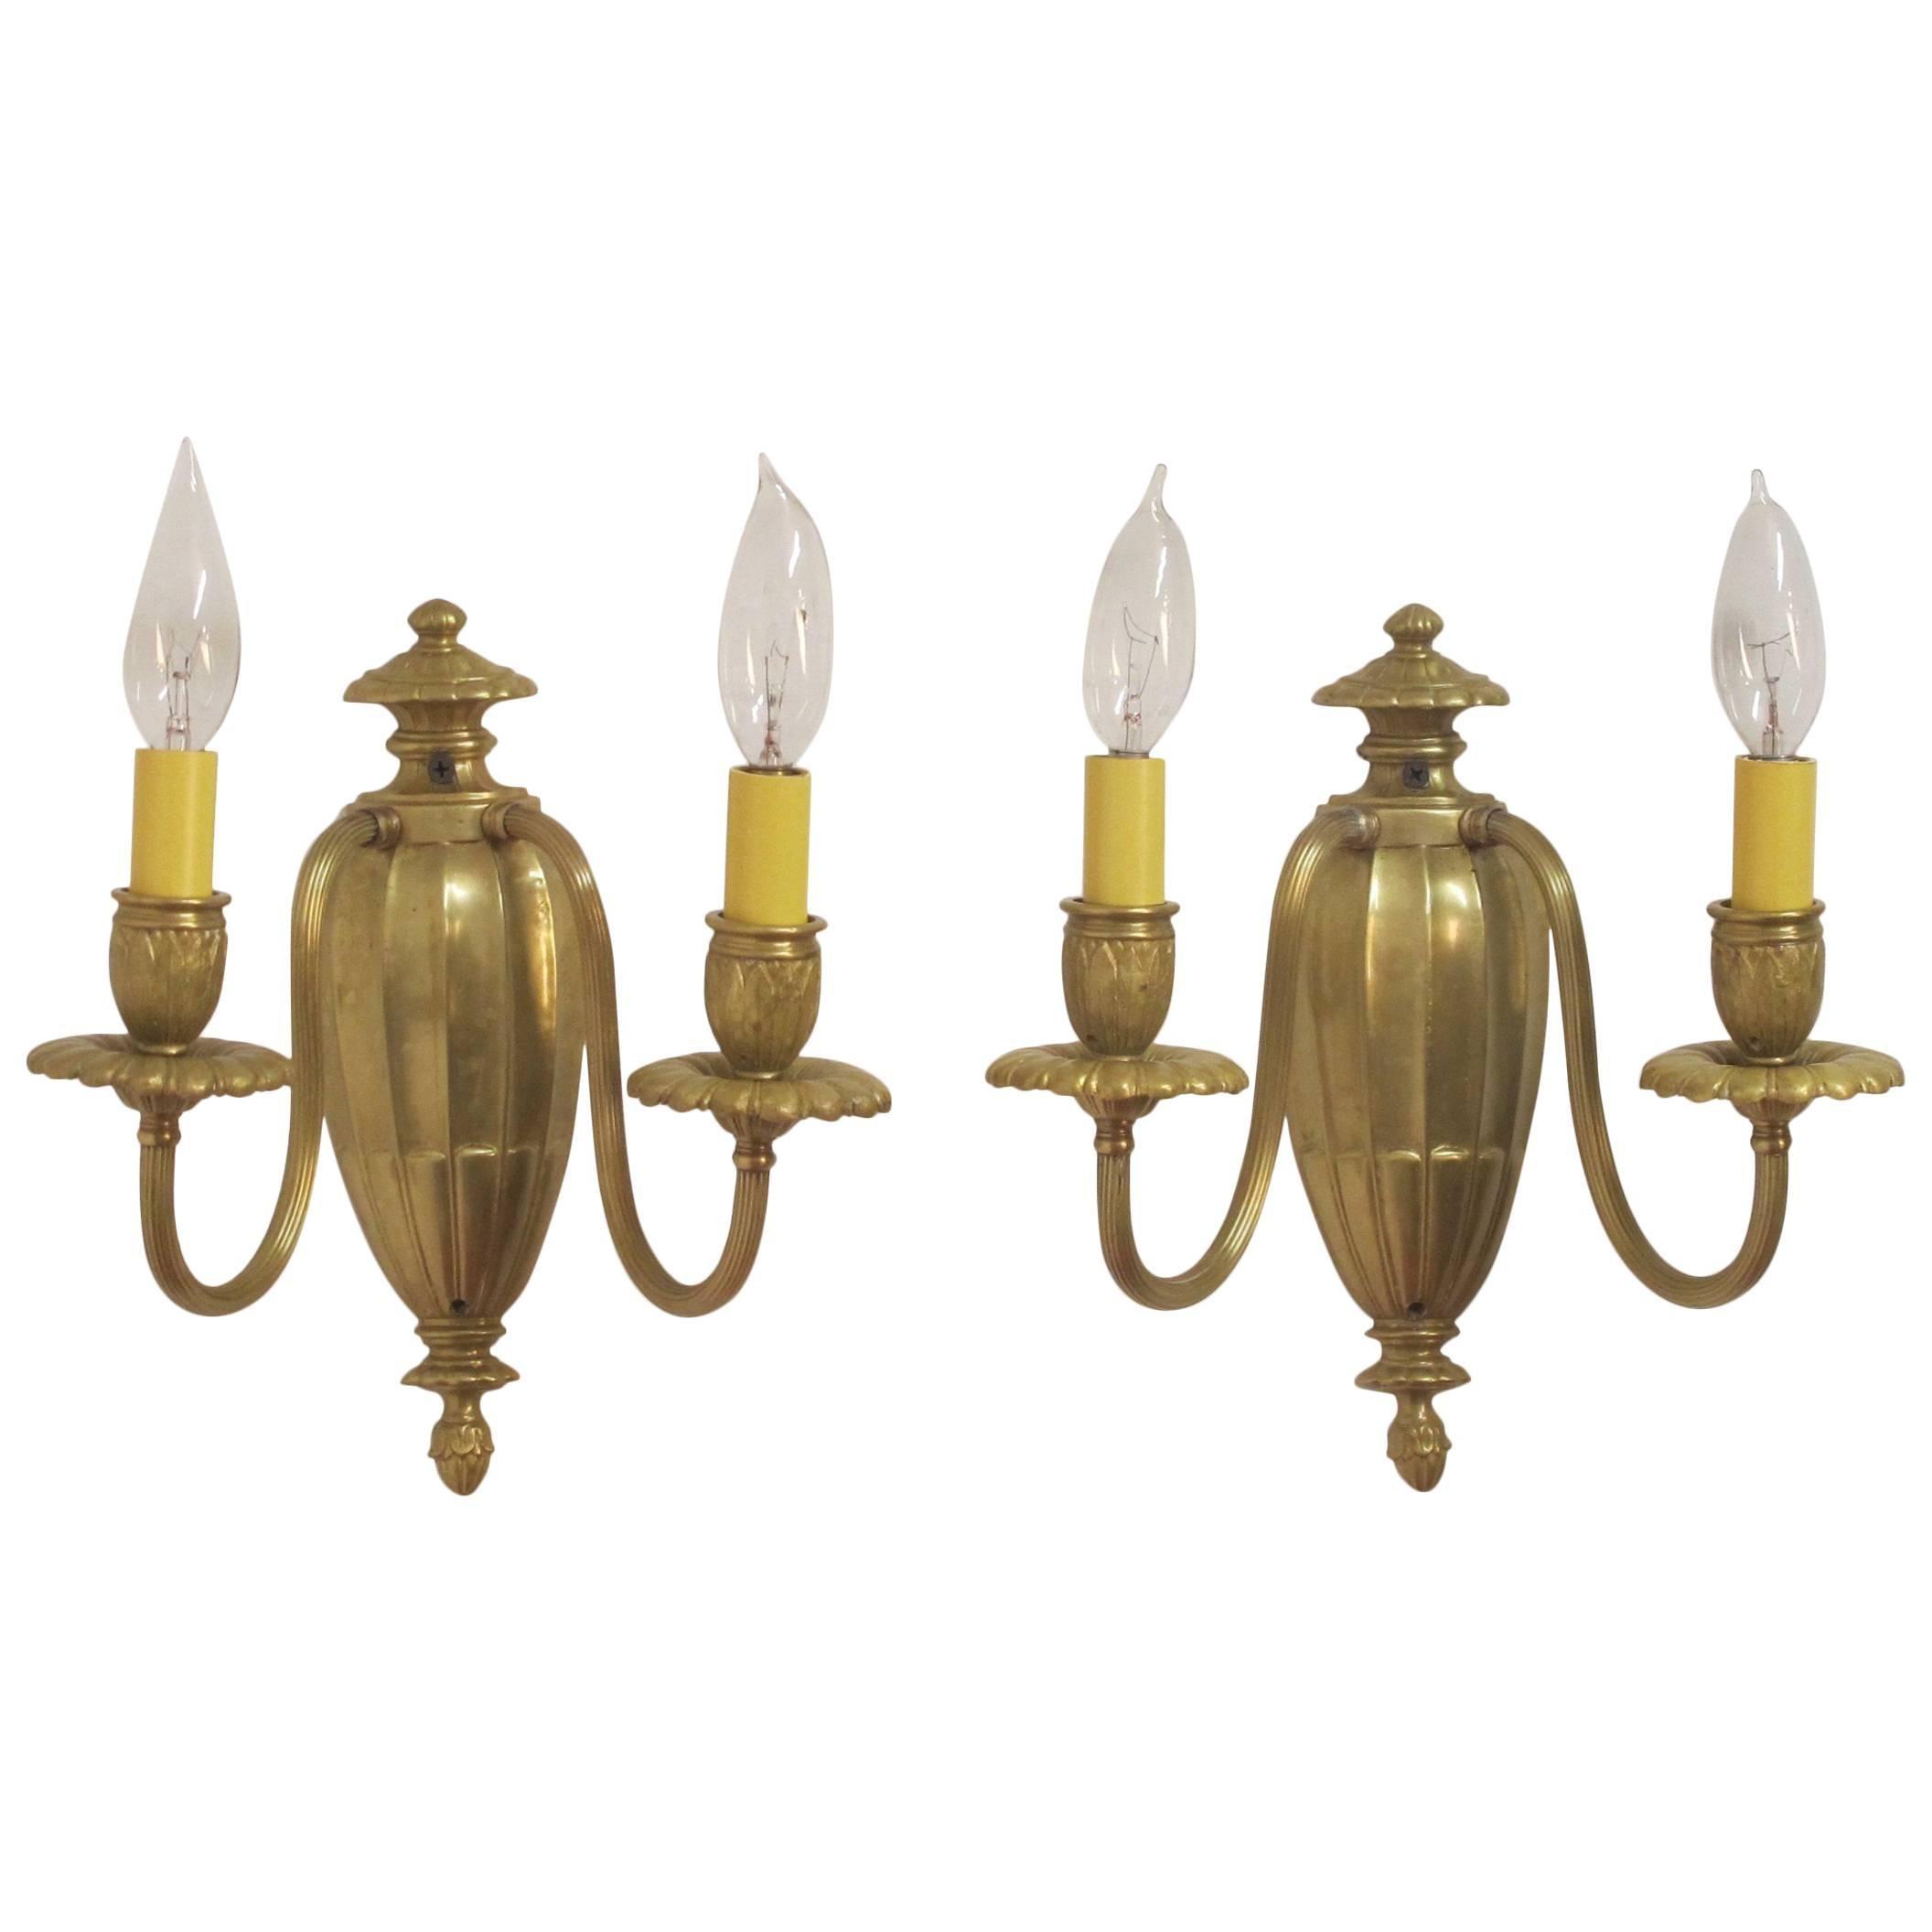 Pair of Edwardian Brass Sconces